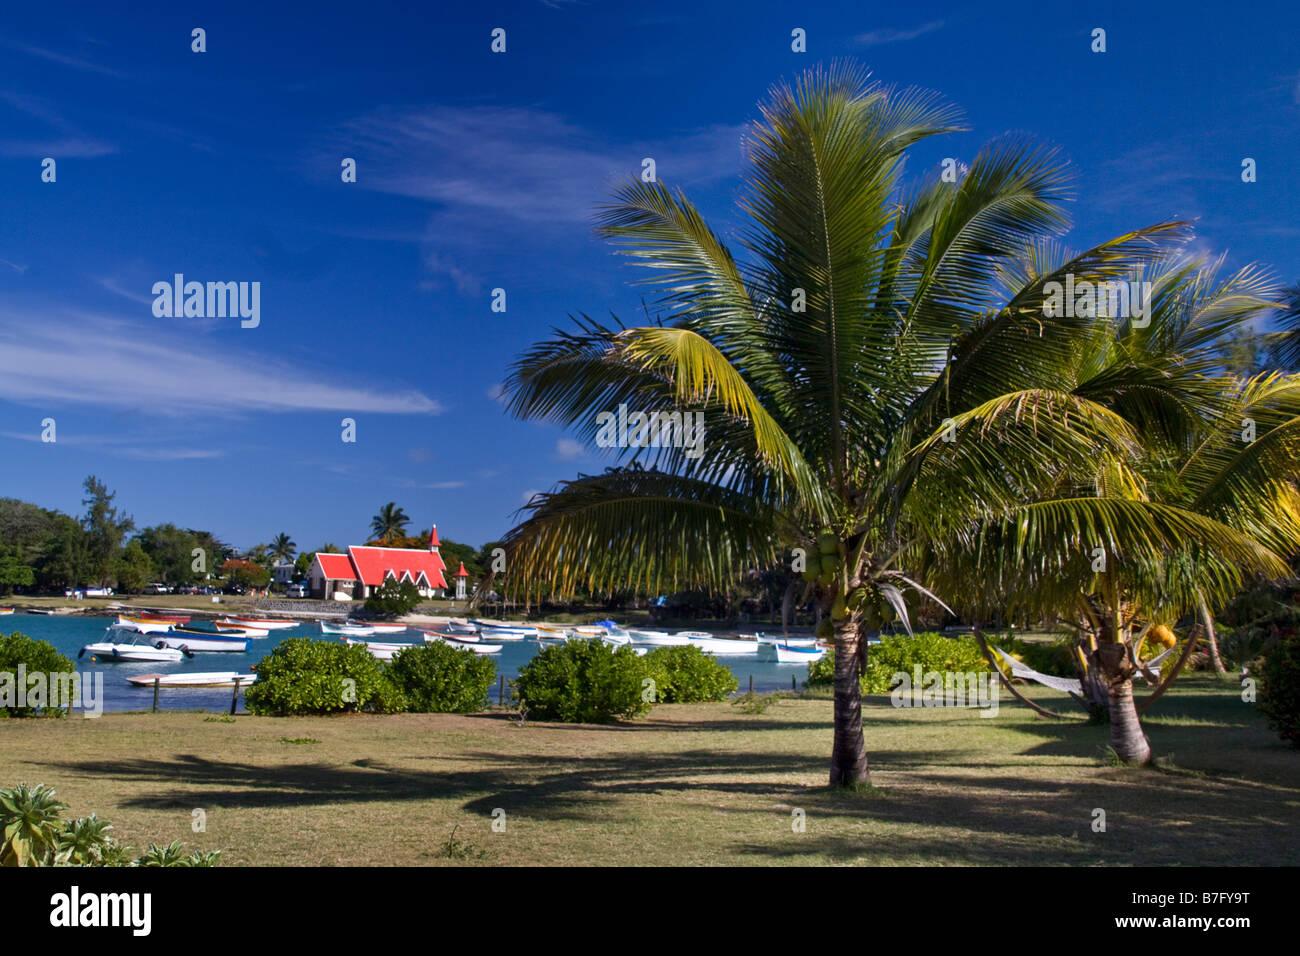 Eglise de Cap Malheureux Mauritius Africa Stock Photo